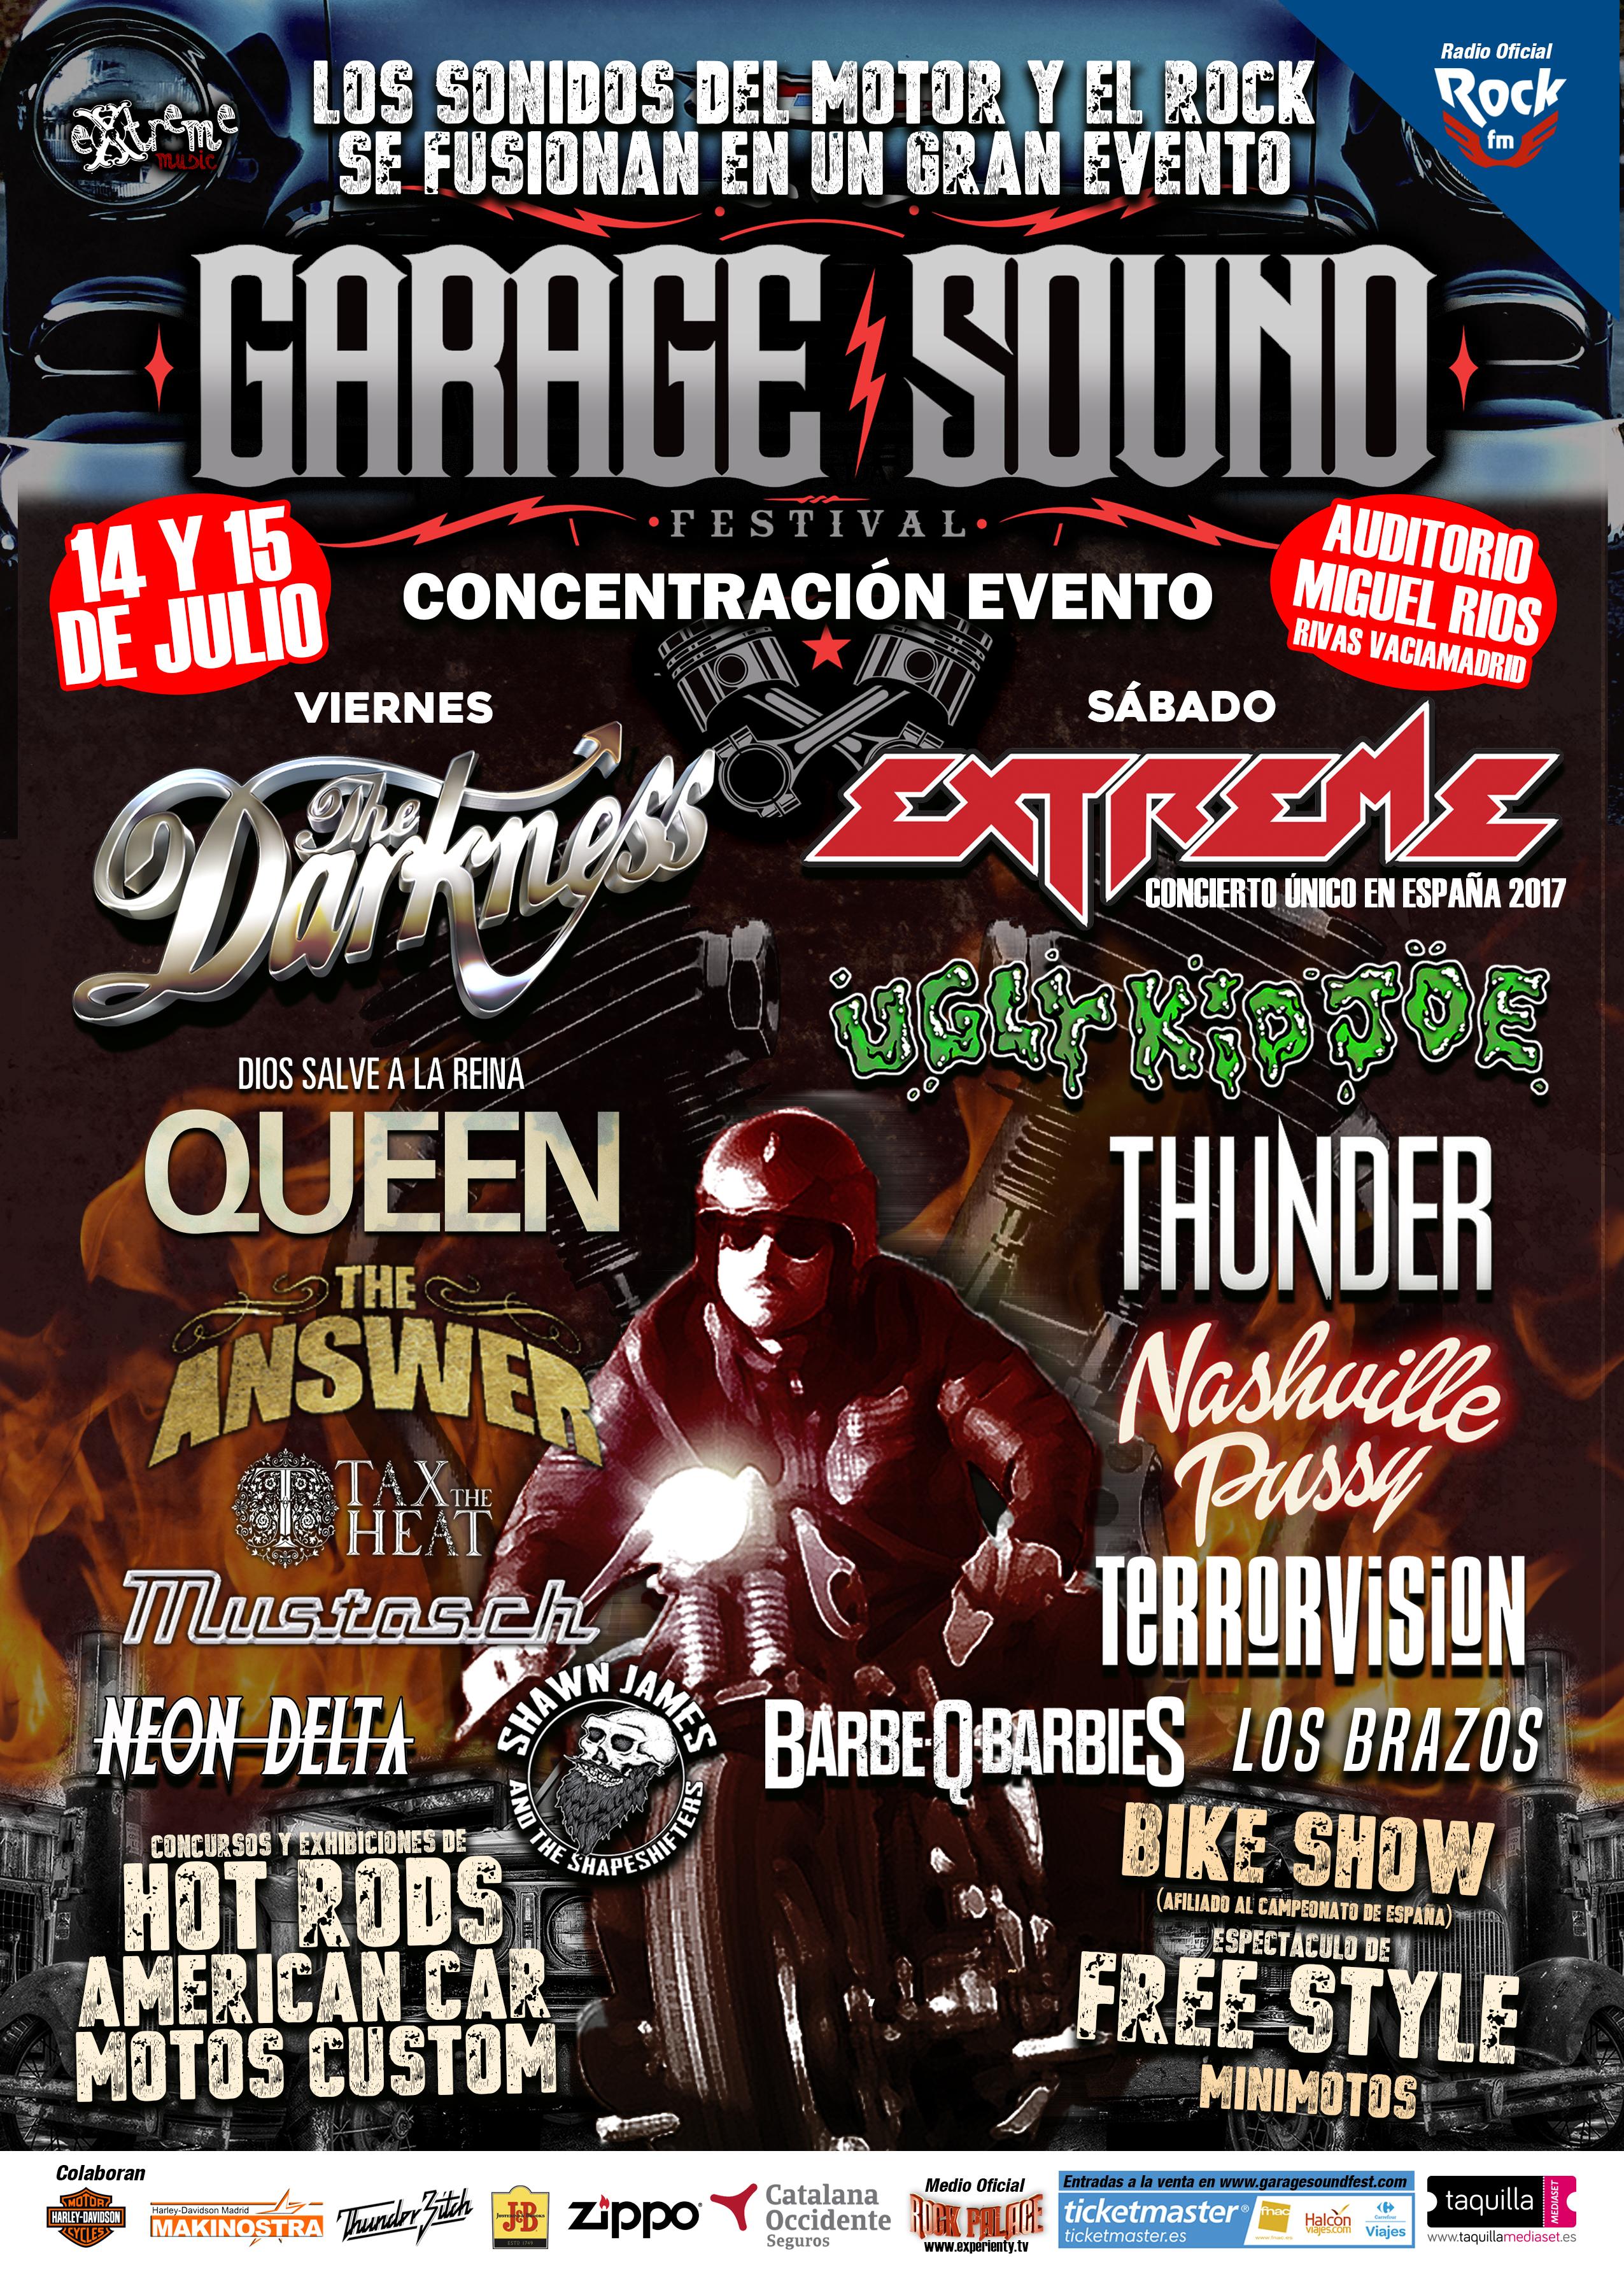 Garage-Sound-Festival-Cartel-V6.jpg